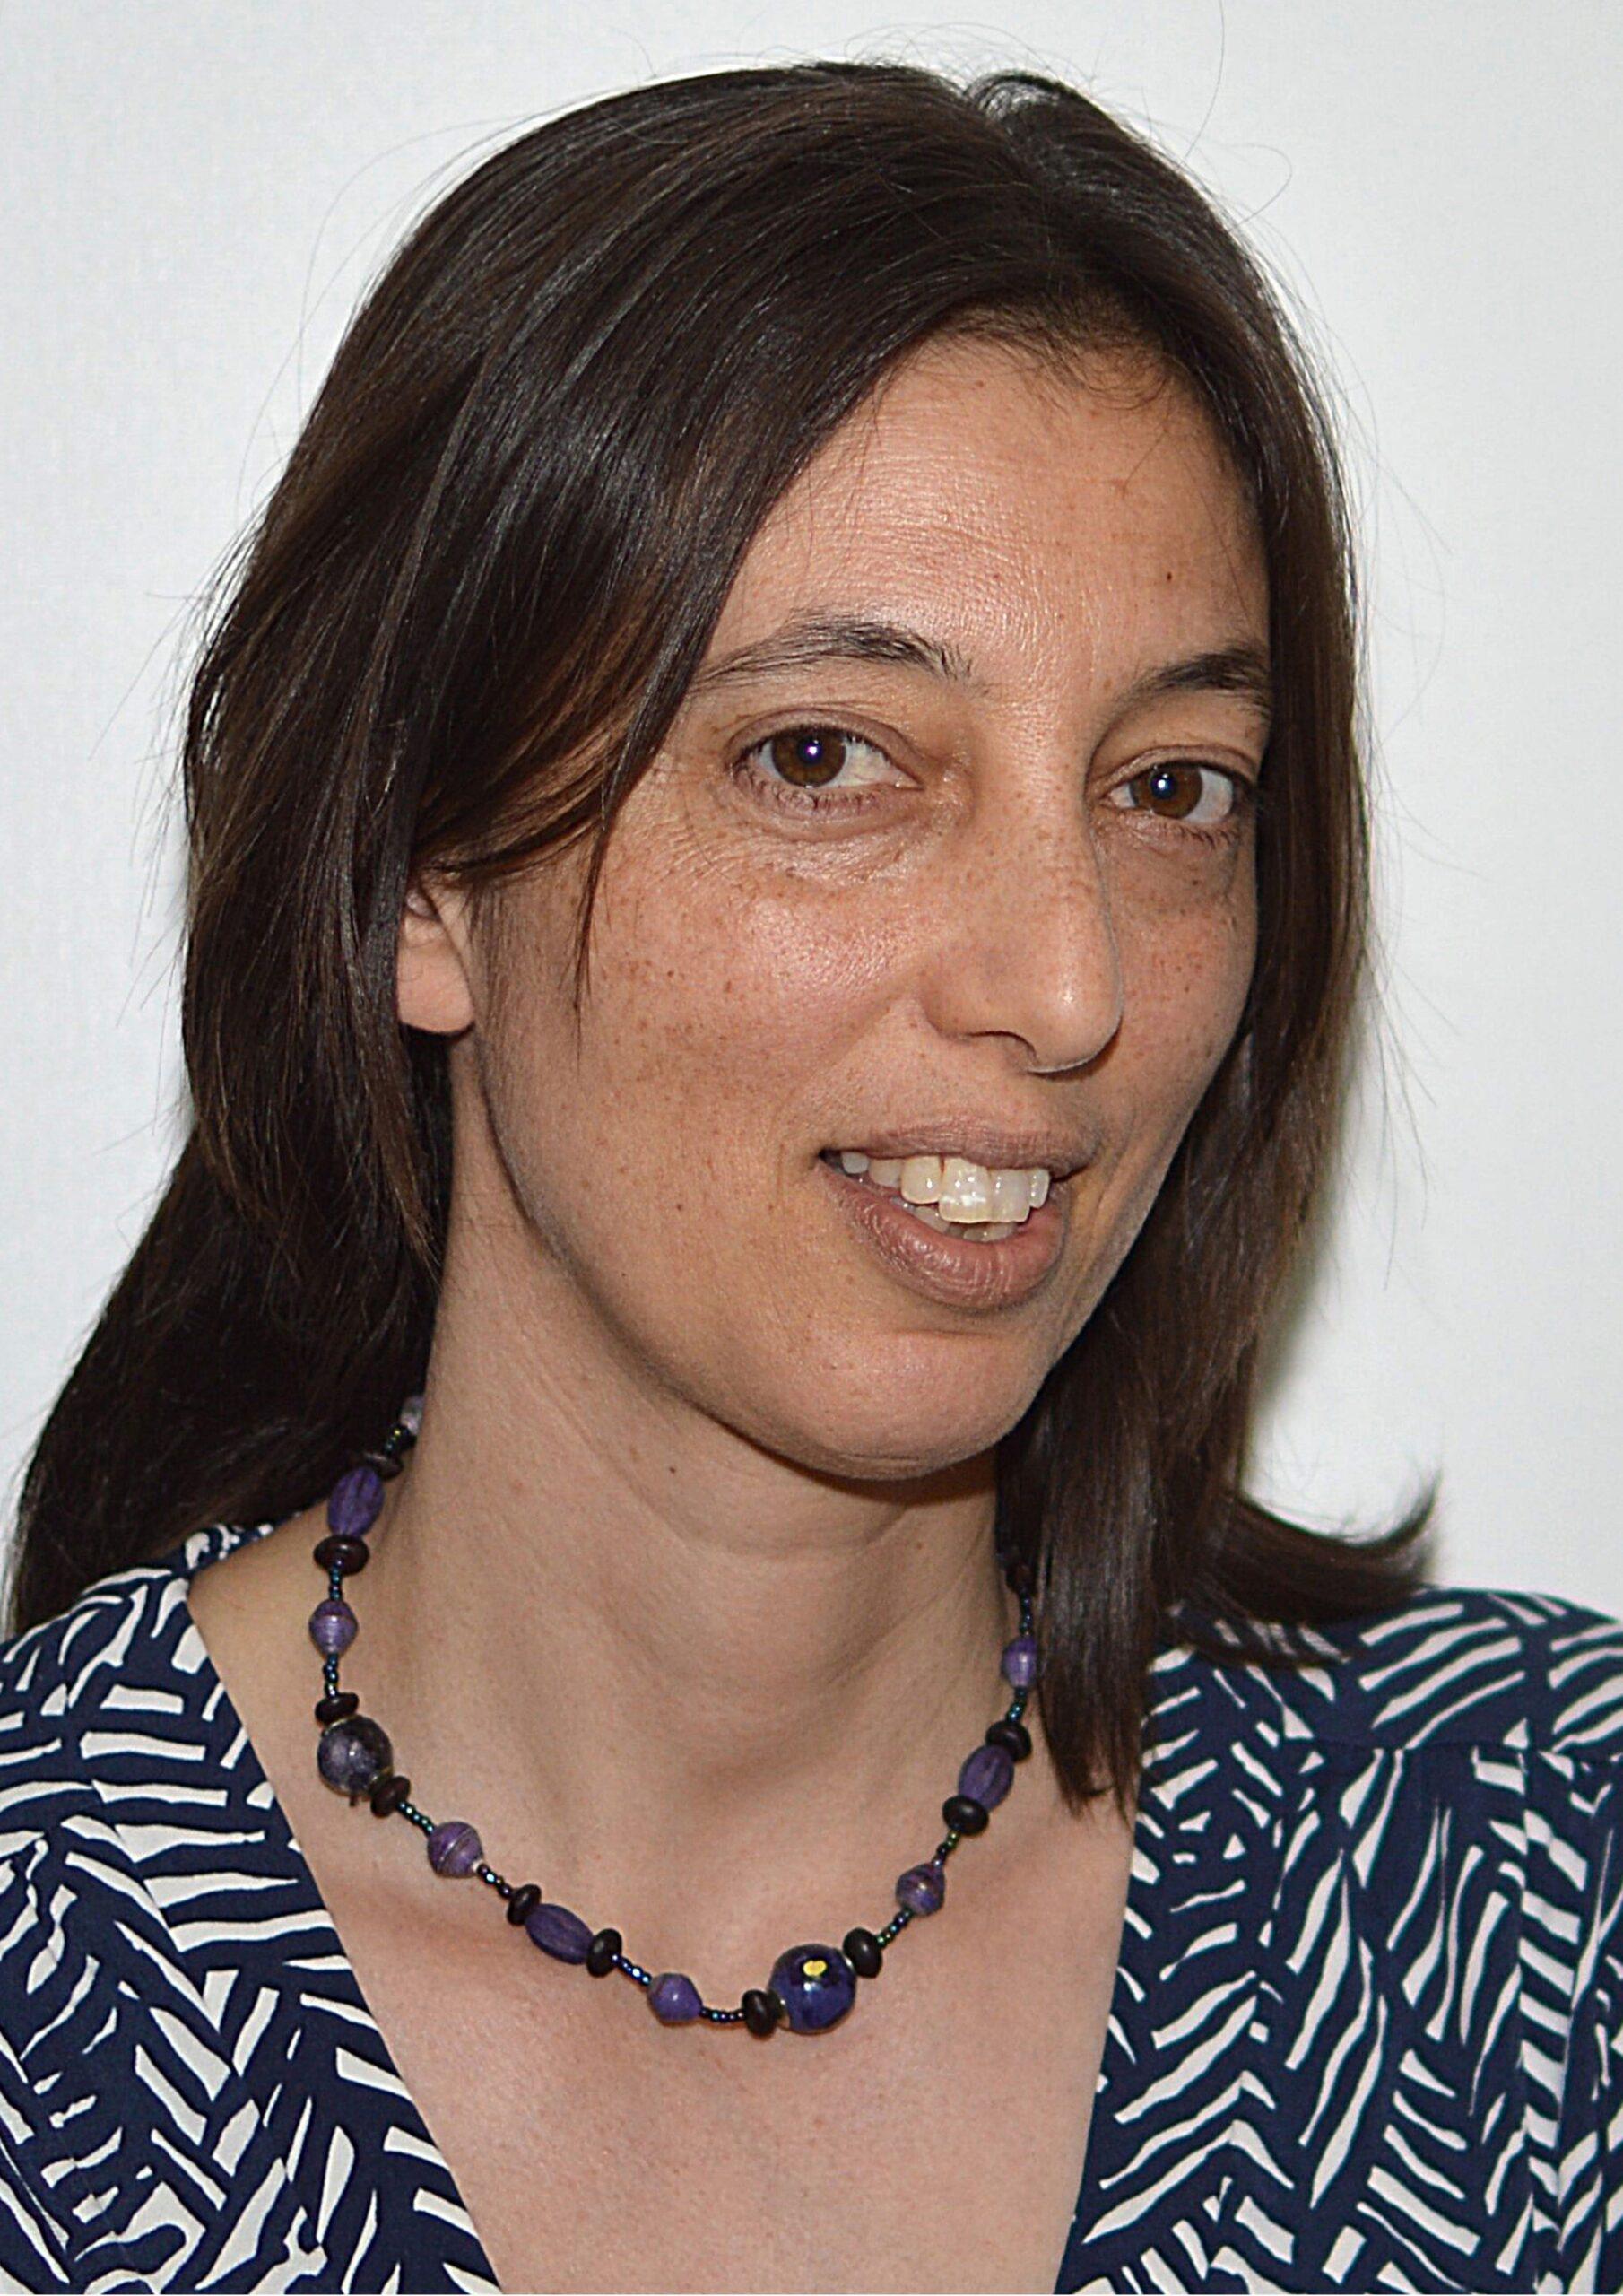 Dr. Mia Dubosarsky